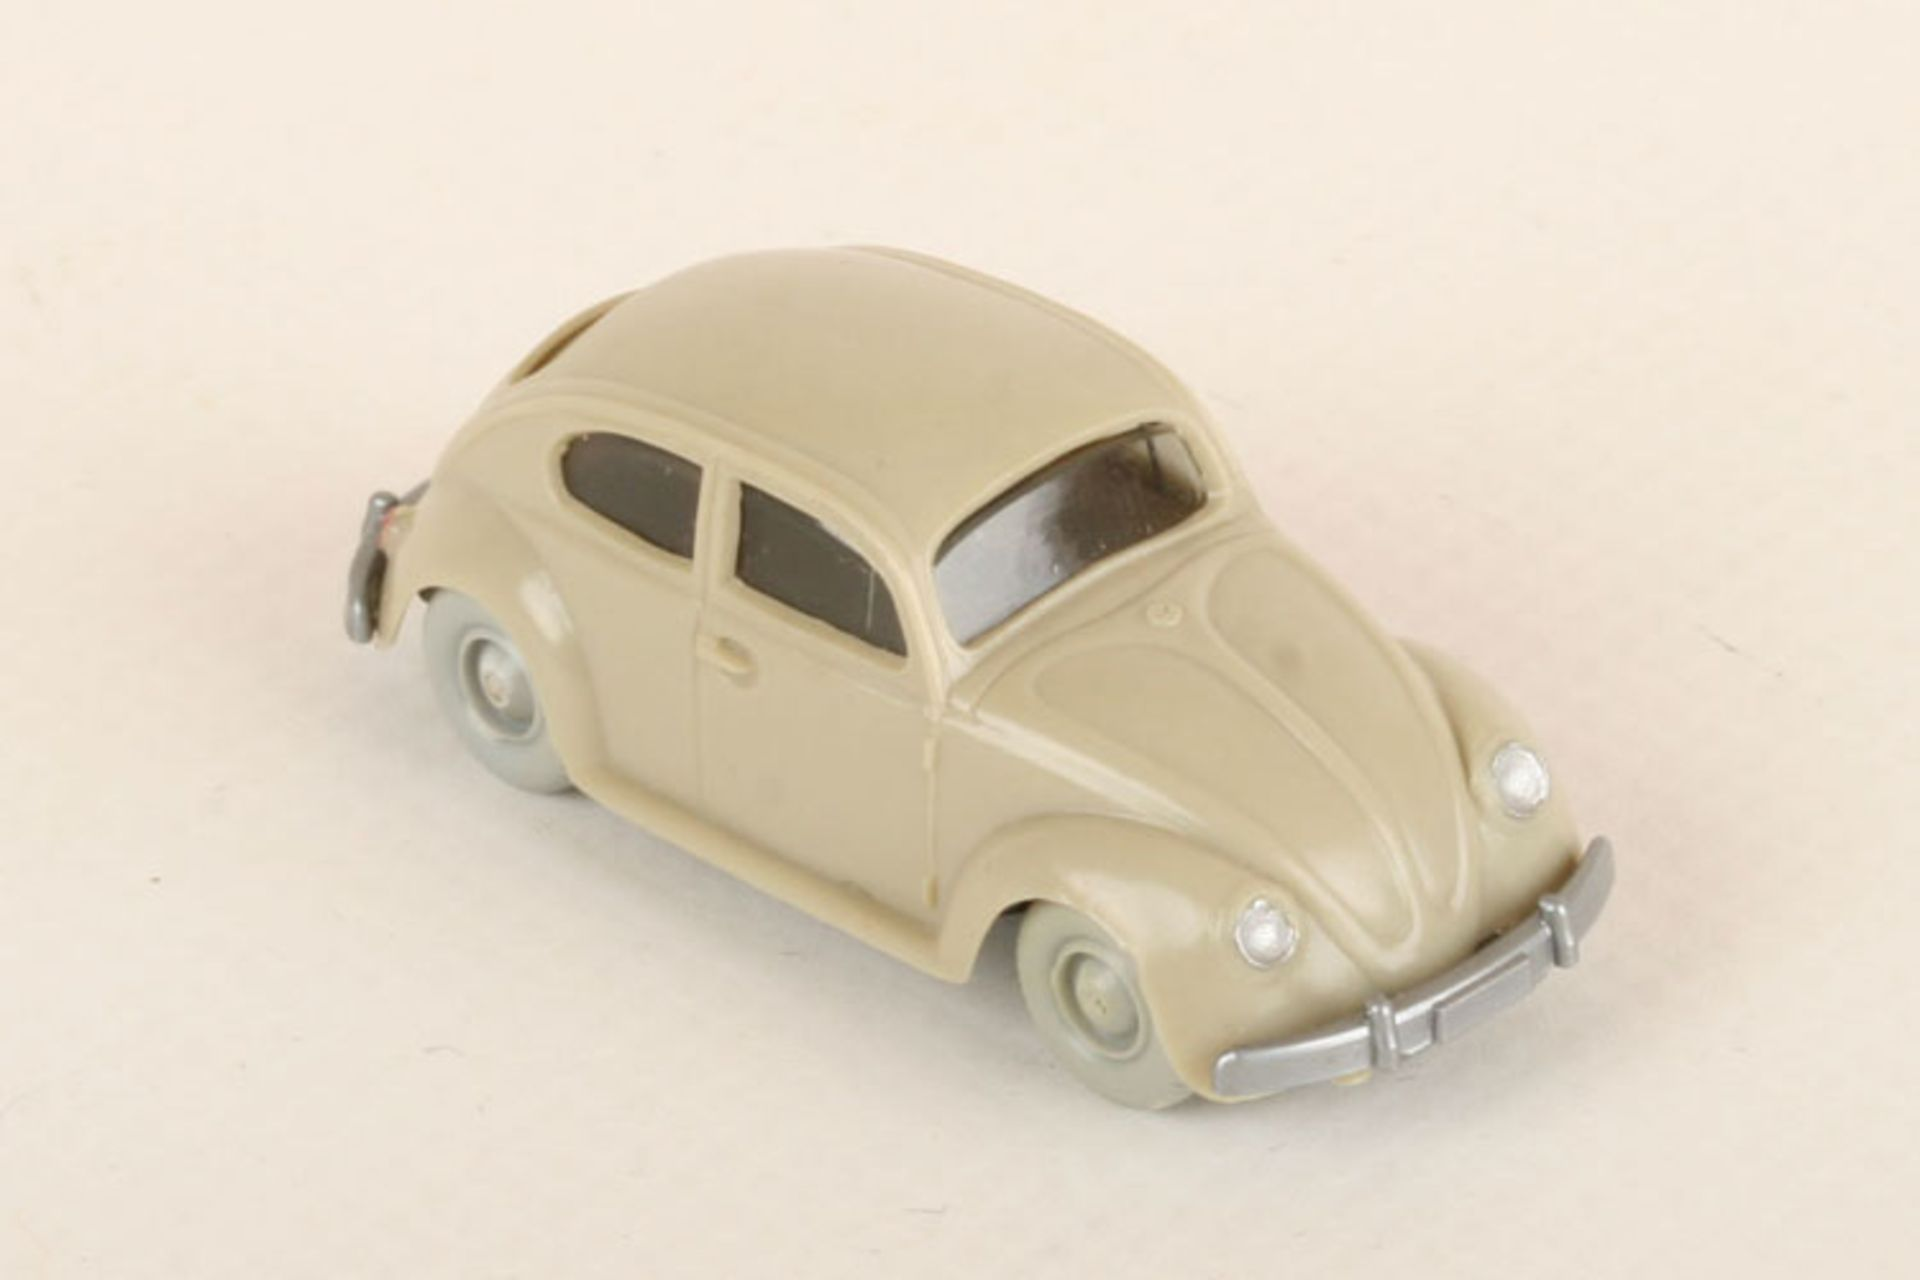 Los 1005 - Wiking VW Käfer Export hellgelbgrau 30/7, extrem seltene Farbvariante, neuwertig